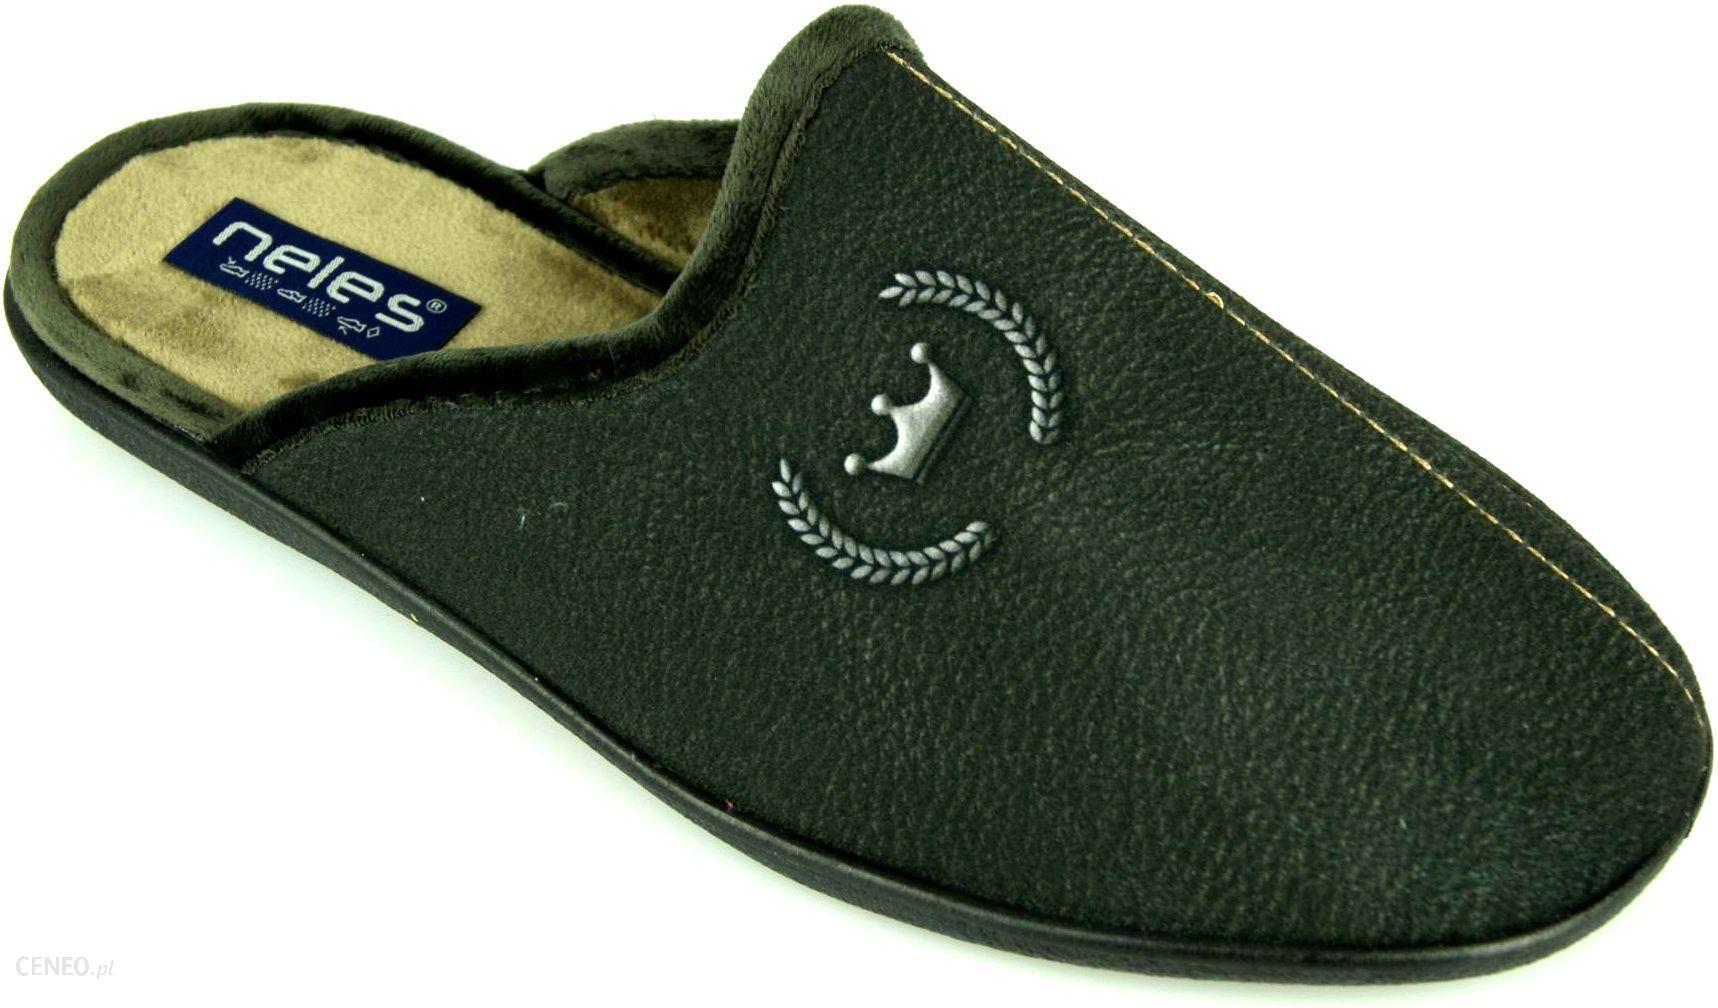 a3be2cdbcb465 Neles 4724.420 Pantofle Neles 4724.420 - Ceny i opinie - Ceneo.pl